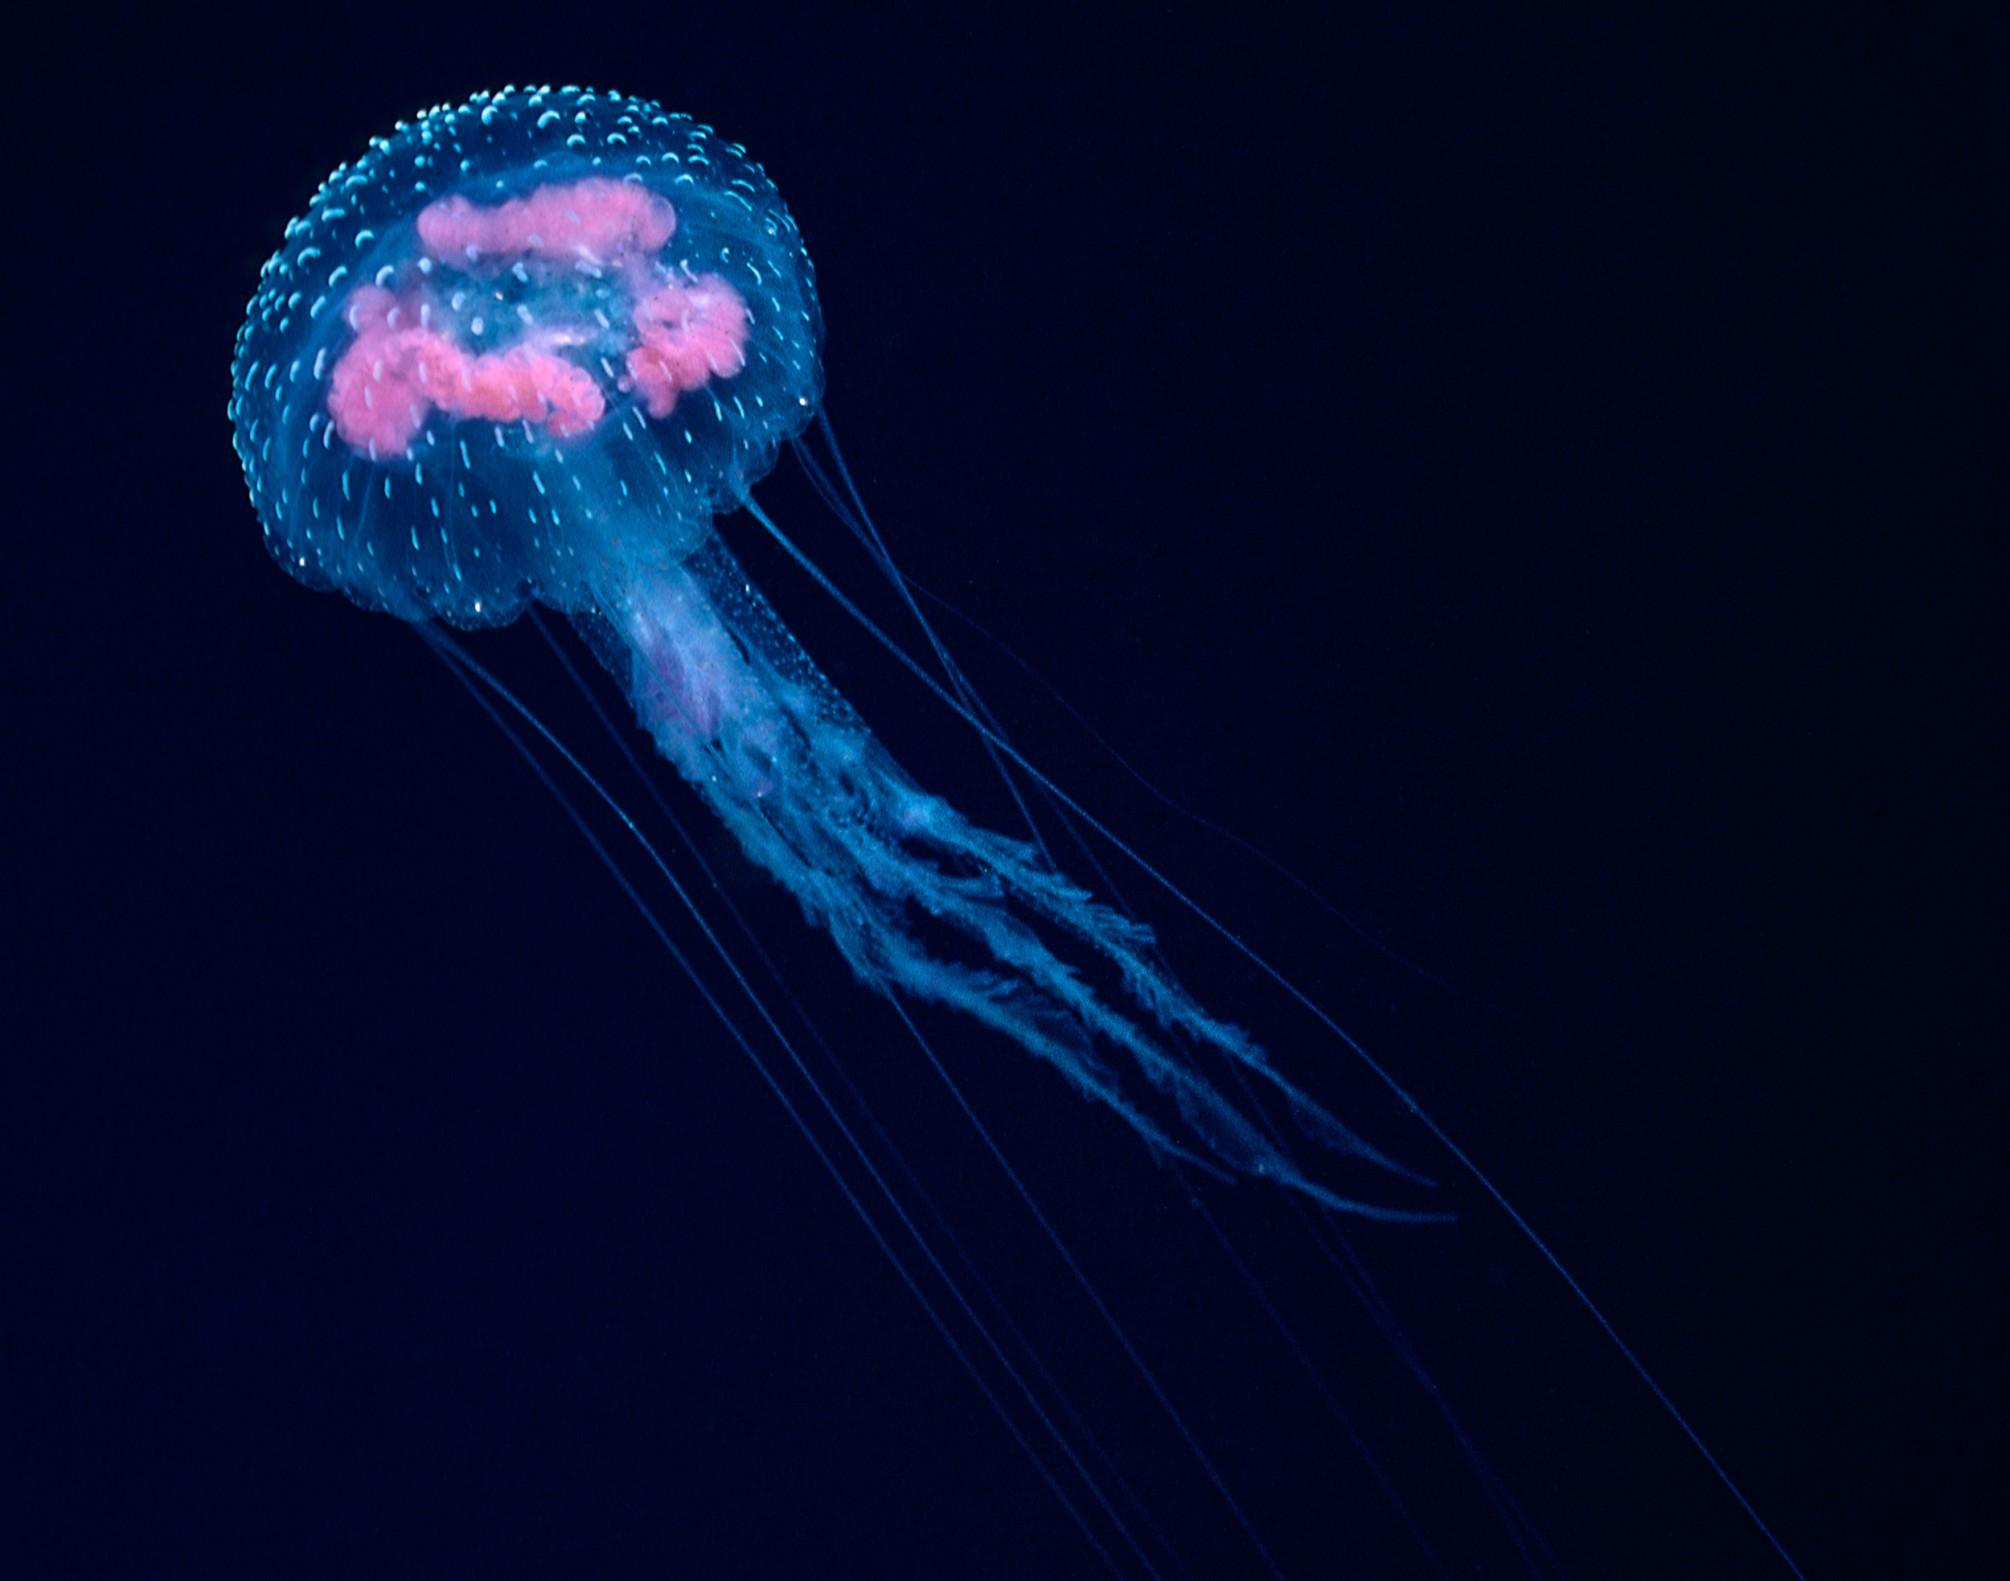 mauve-stinger-bioluminescence